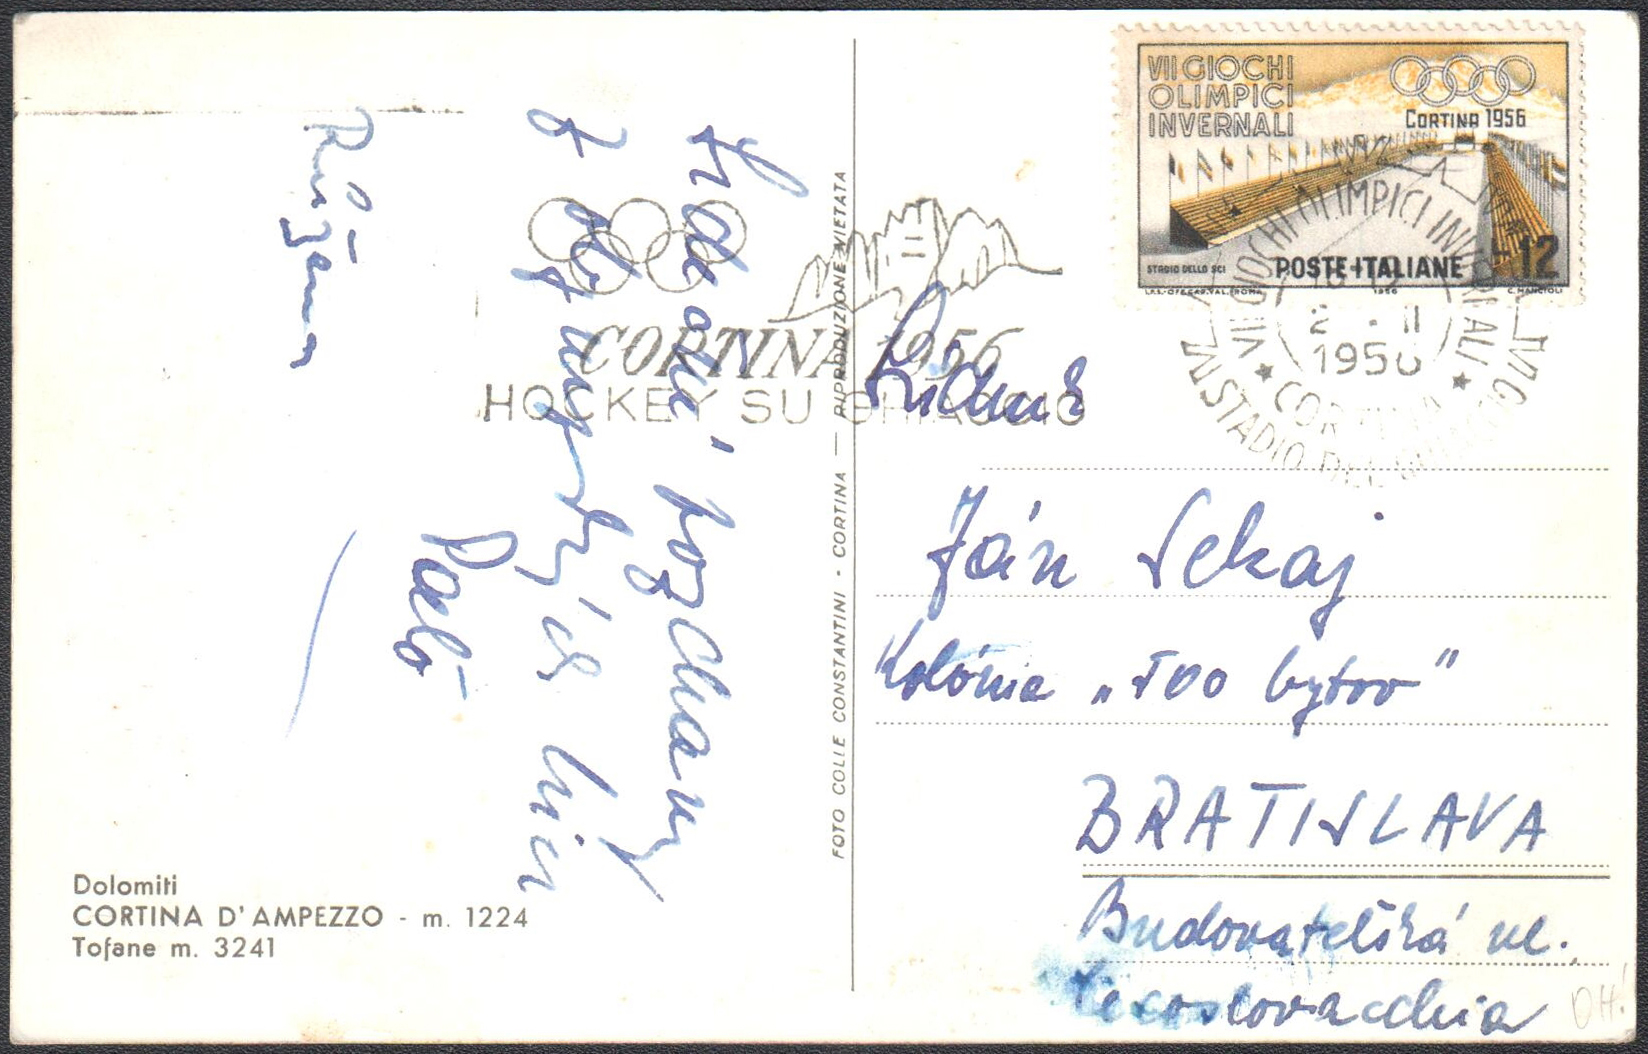 TALIANSKO 1956 - Zimné olympijské hry CORTINA D´AMPEZZO 1956 (¾adový hokej)